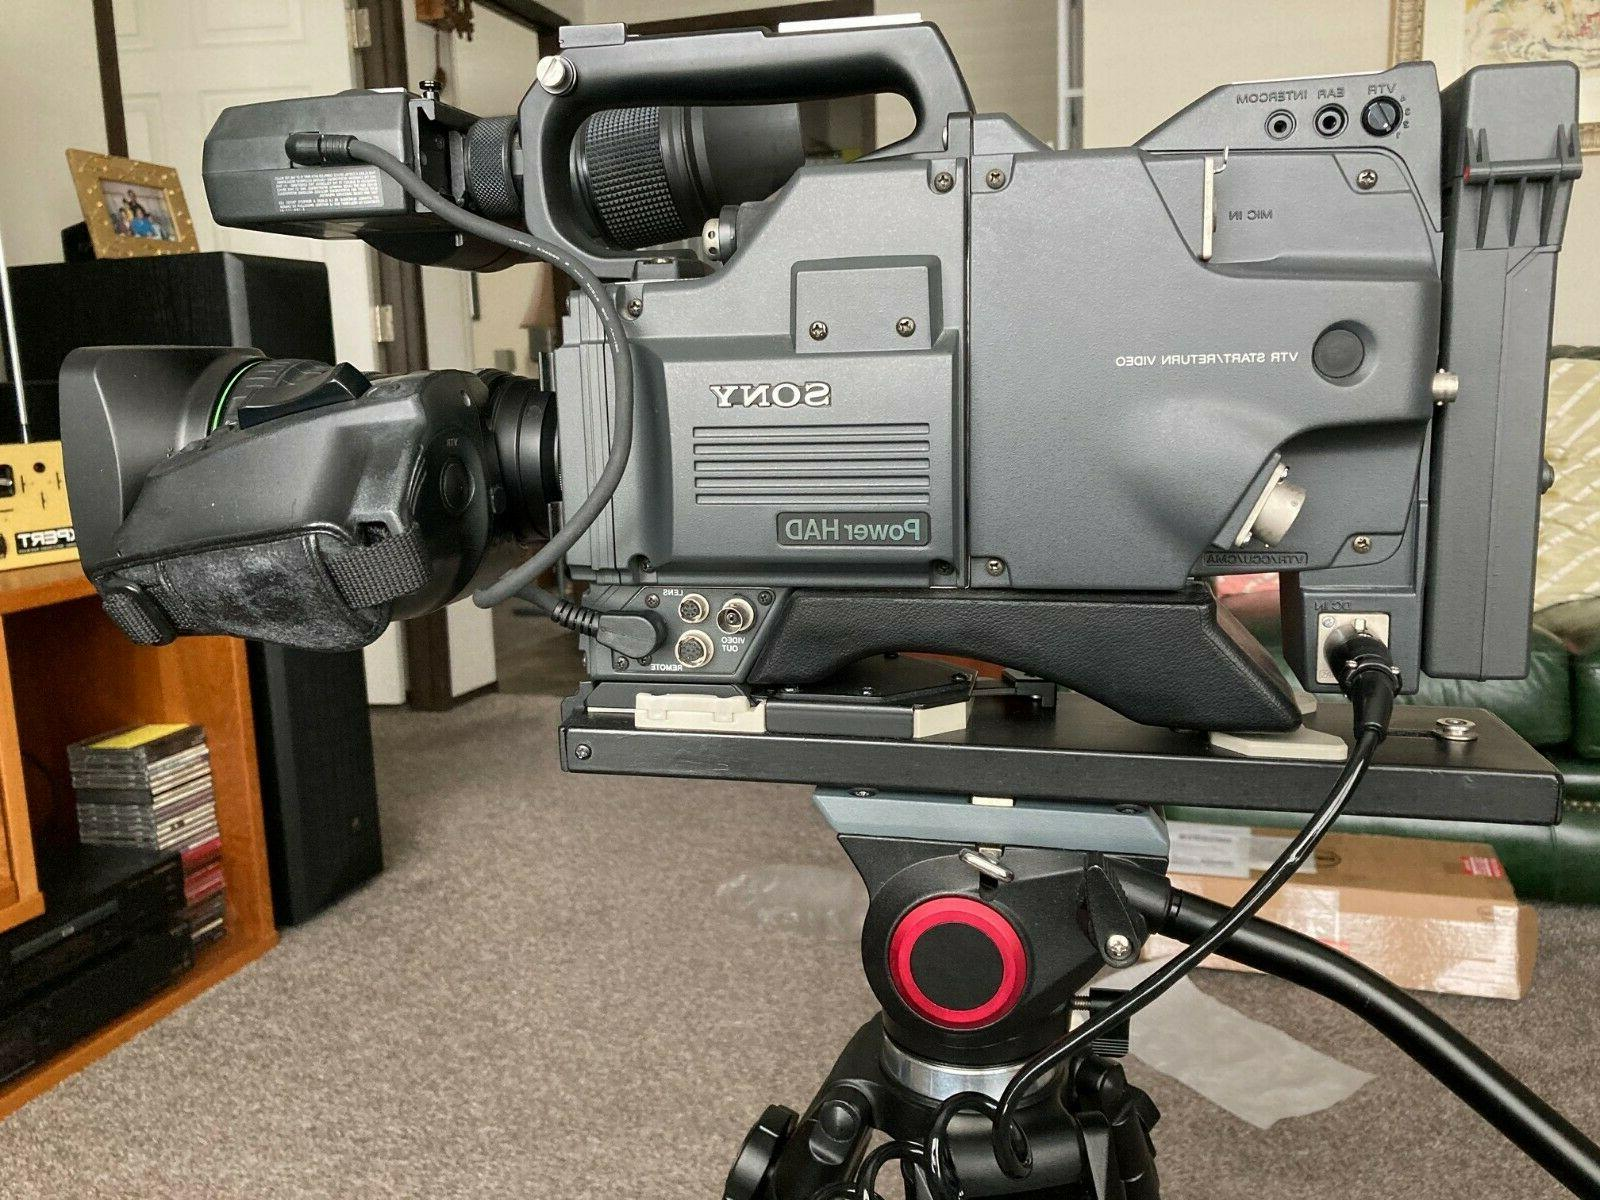 SONYdxc-327a color camera